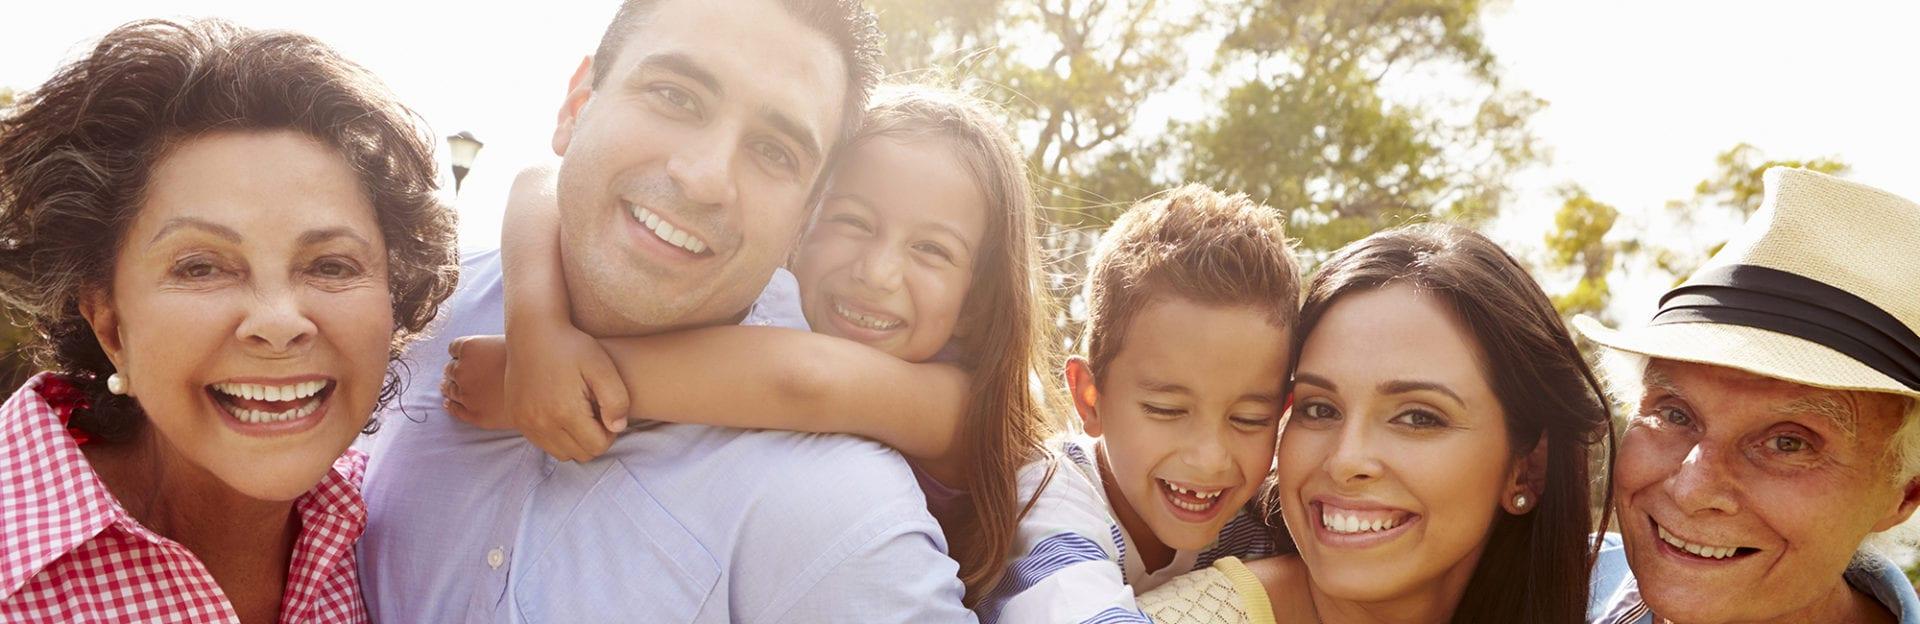 Family Programs | The Gateway Family YMCA